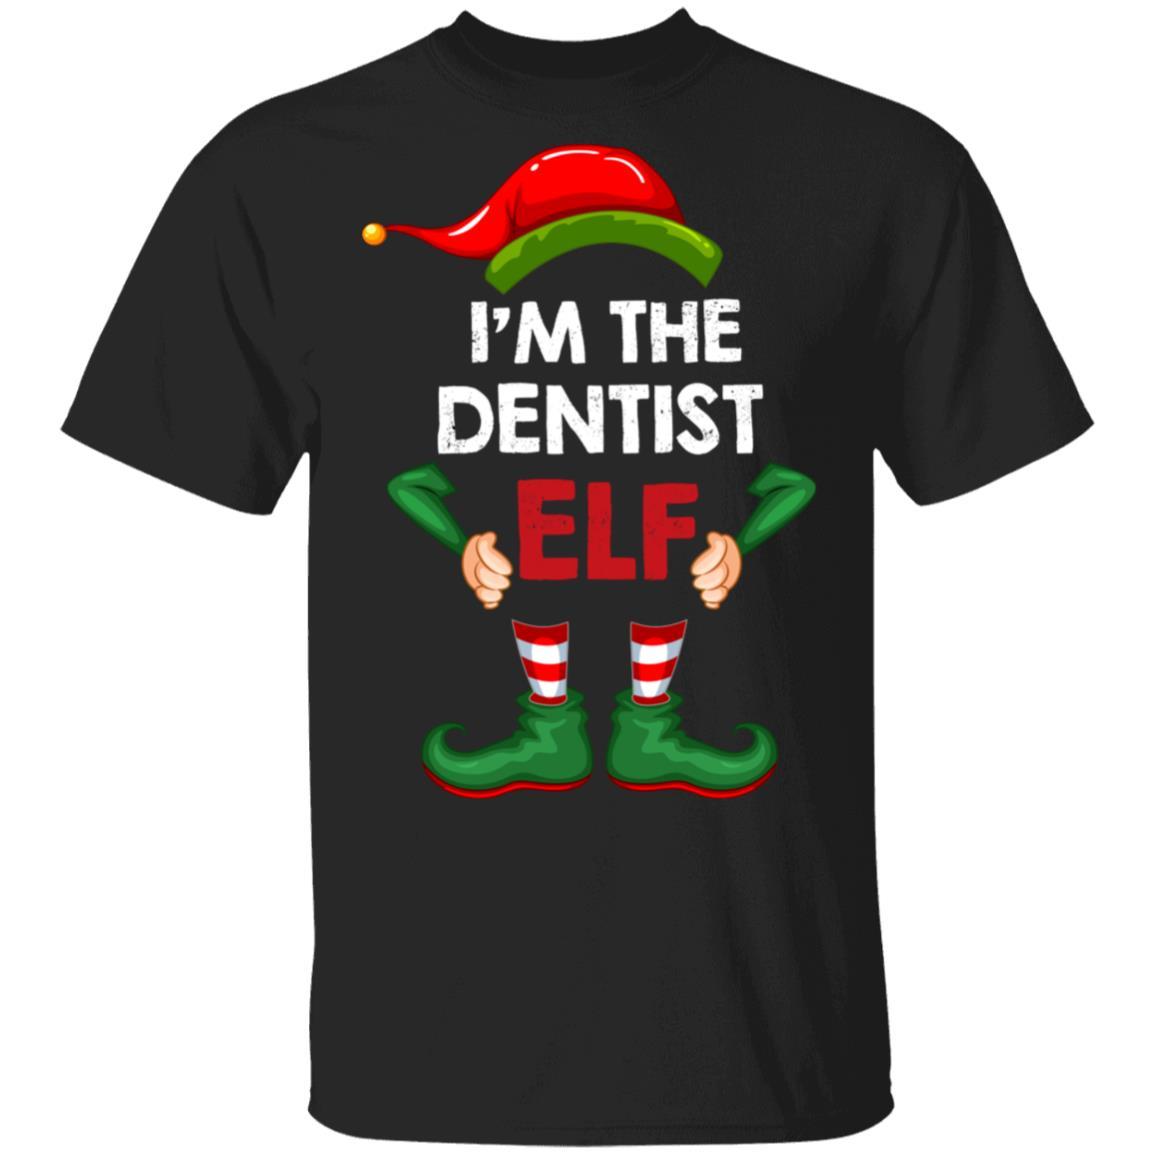 I'm The Dentist Elf Unisex Short Sleeve